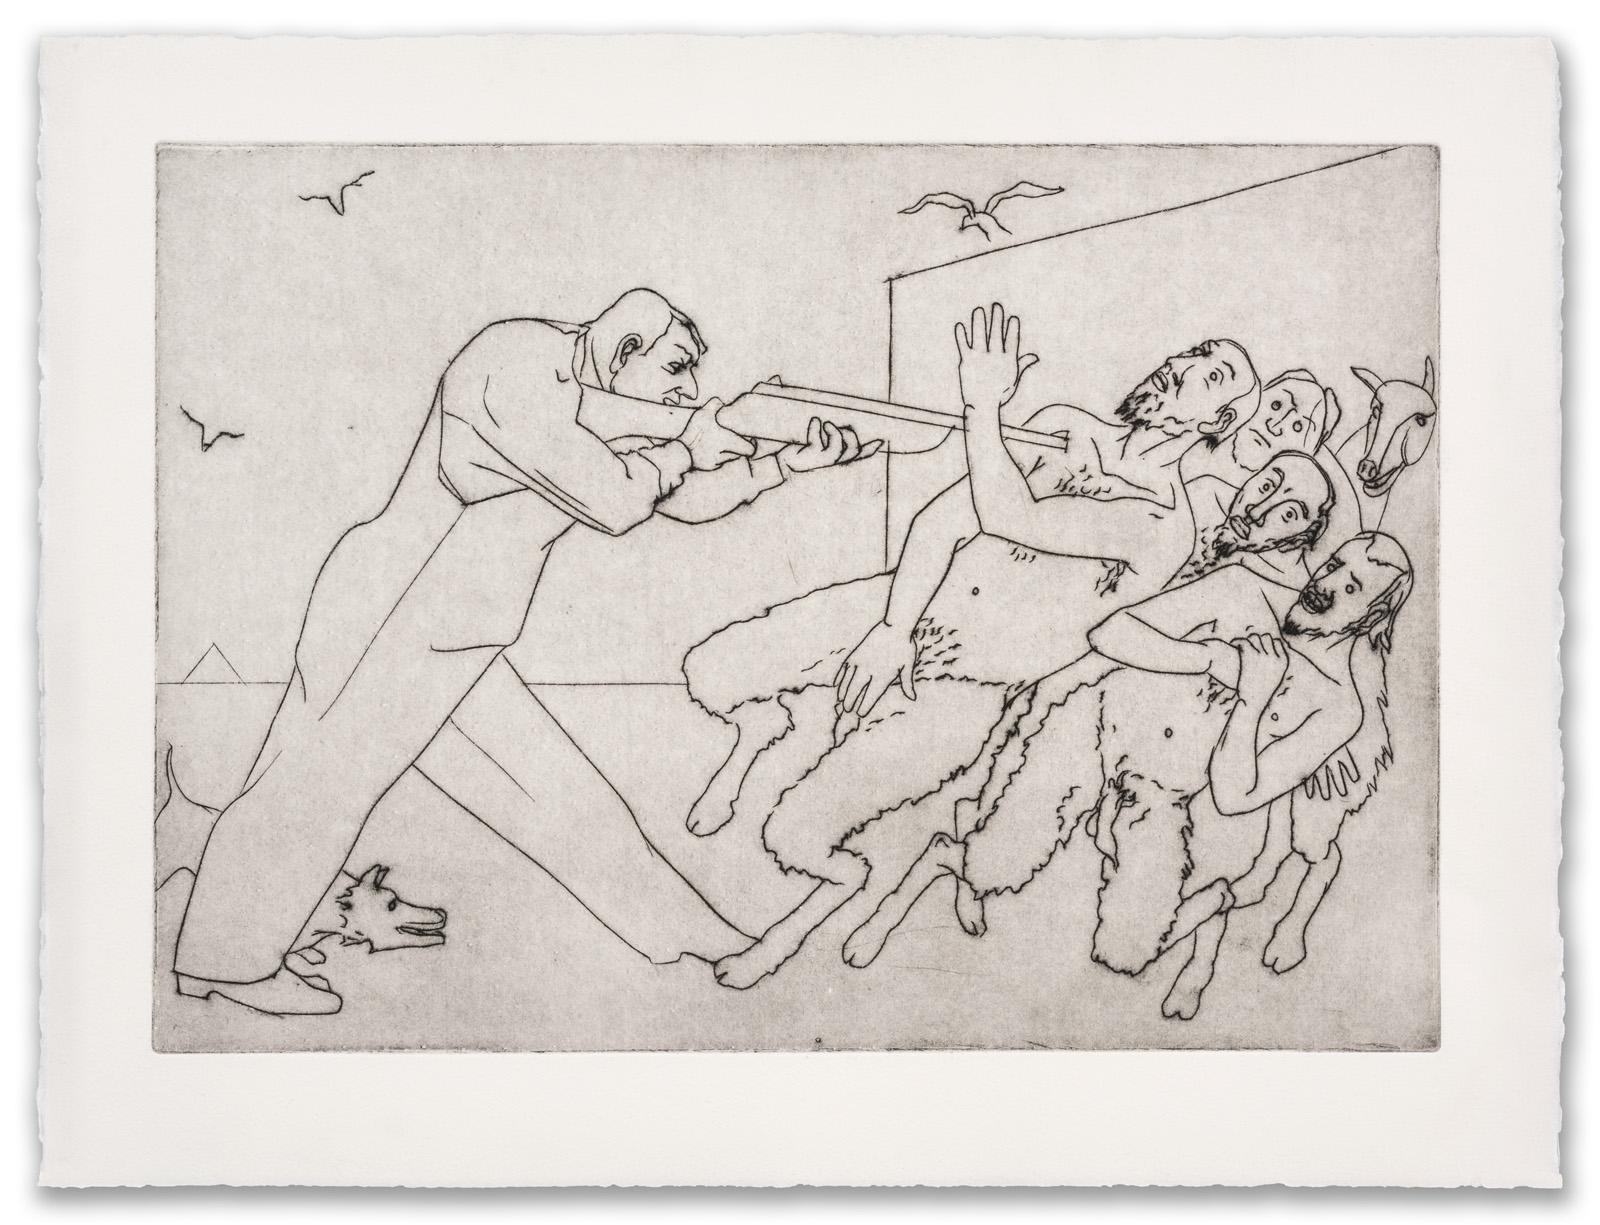 Francis West, (British 1936-2015), After Goya, c.1999 (2017 Edition).